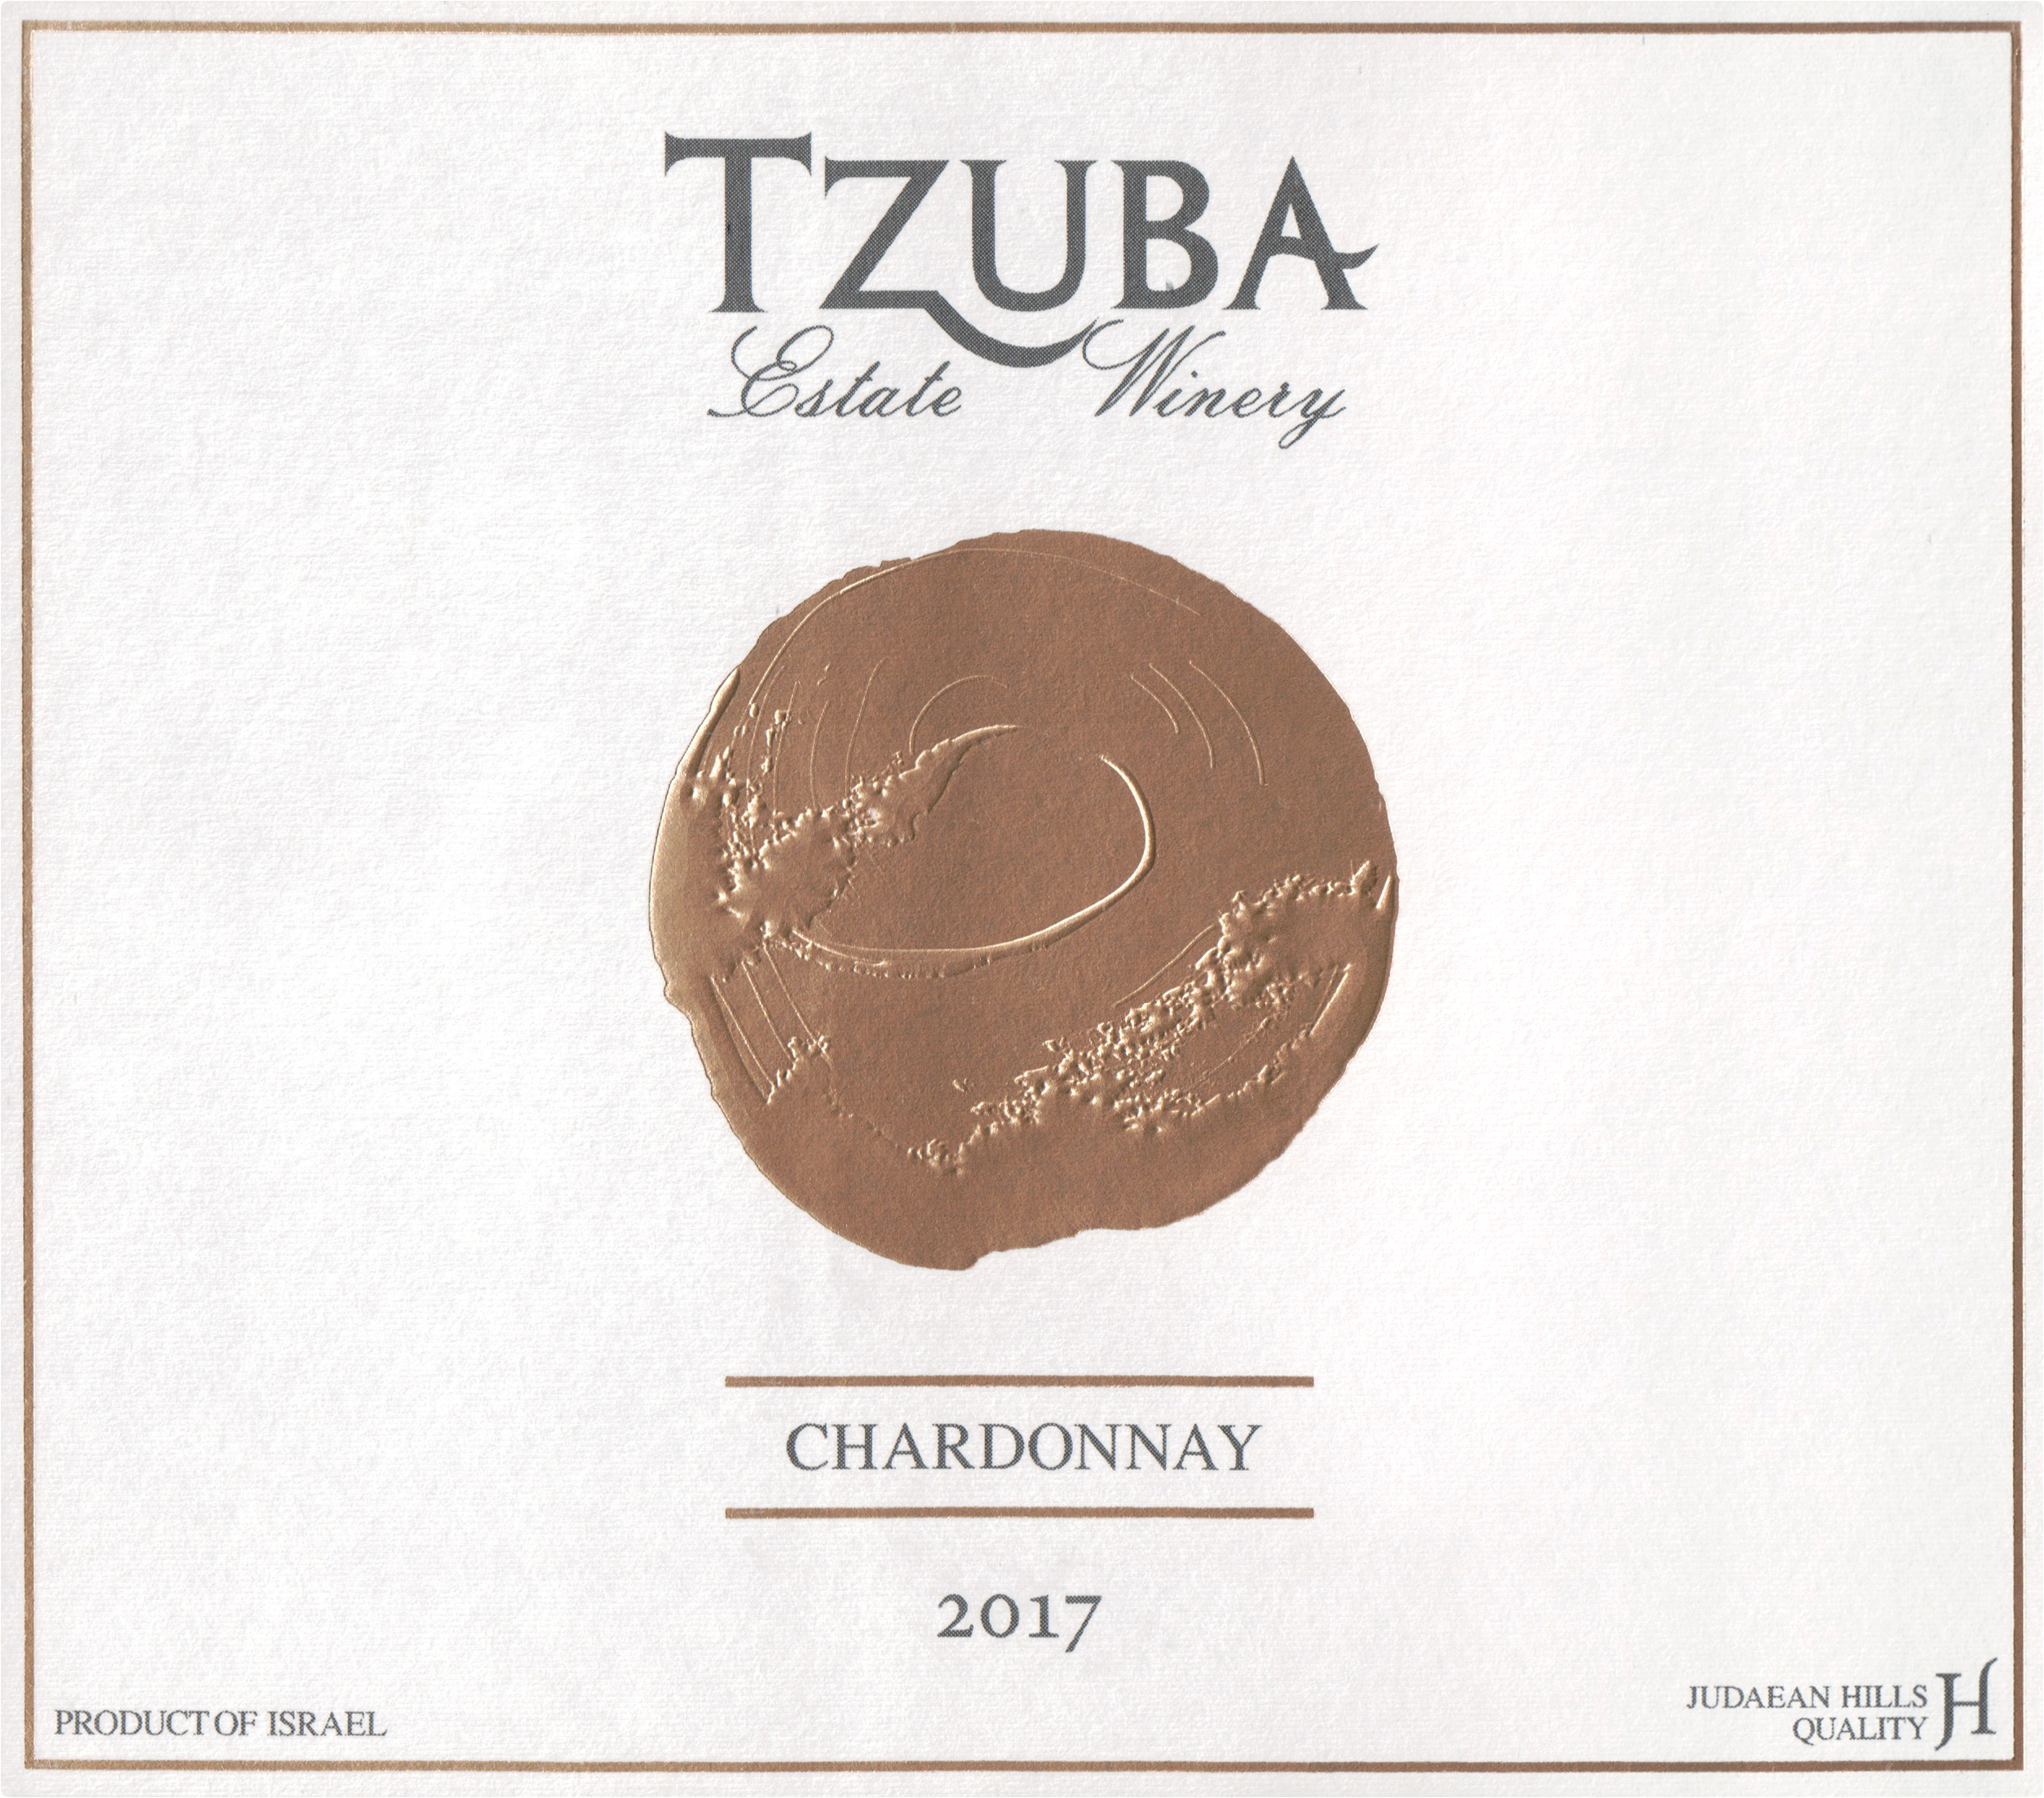 Tzuba Chardonnay Judean Hills 2017